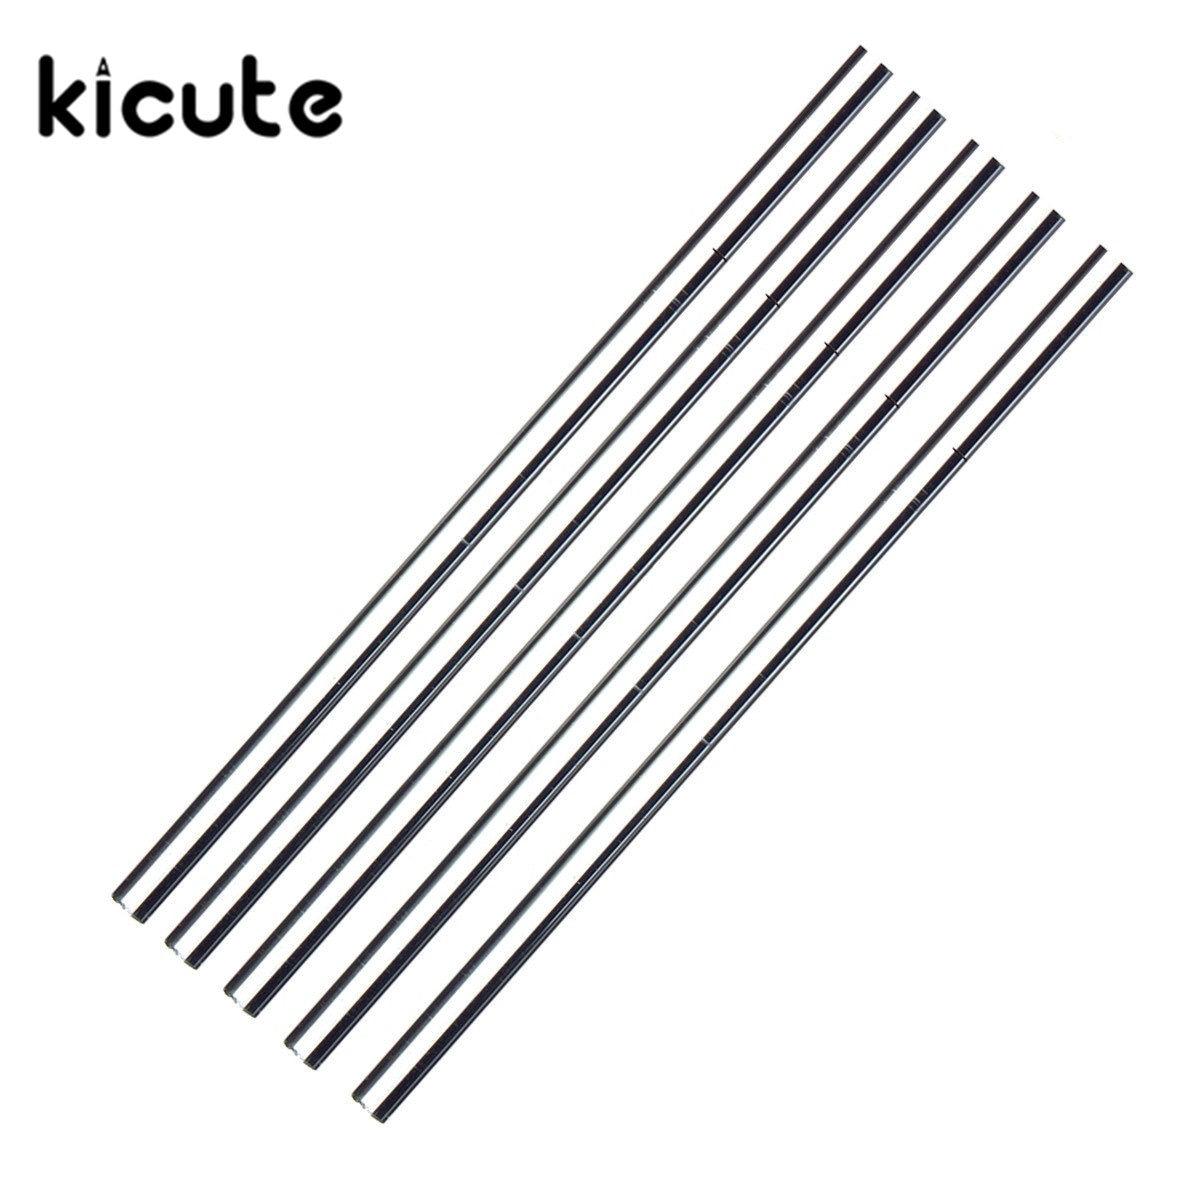 KiCute 5pcs/Set Glass Stirring Rod For Lab Use Stiring Stirrer Laboratory 150mmx5mm Transparent School Tools Glass Buret Mixer